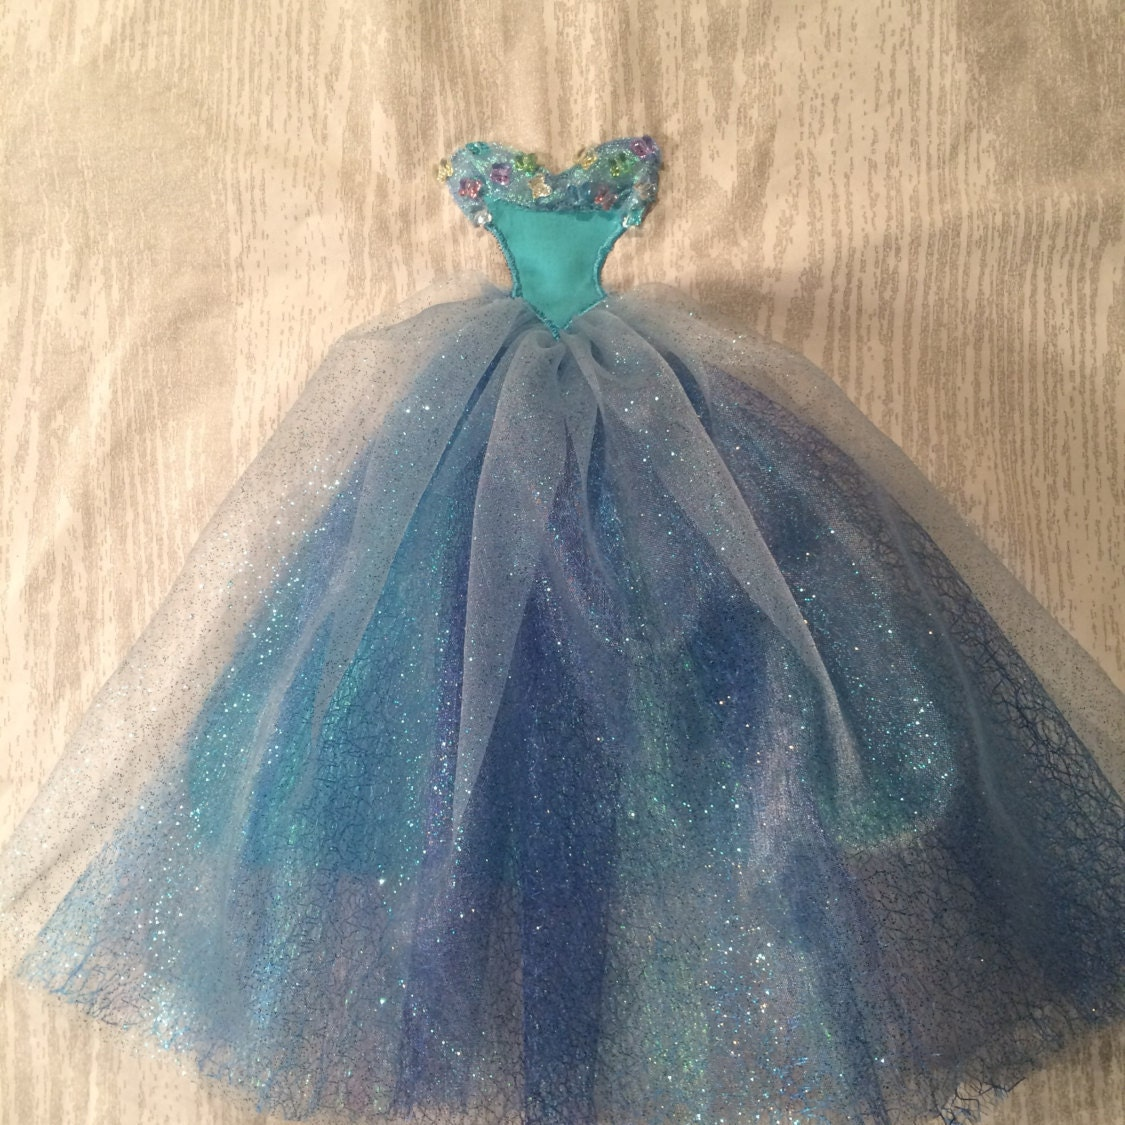 Disney Princess Cinderella Dress Applique Pattern Inspired